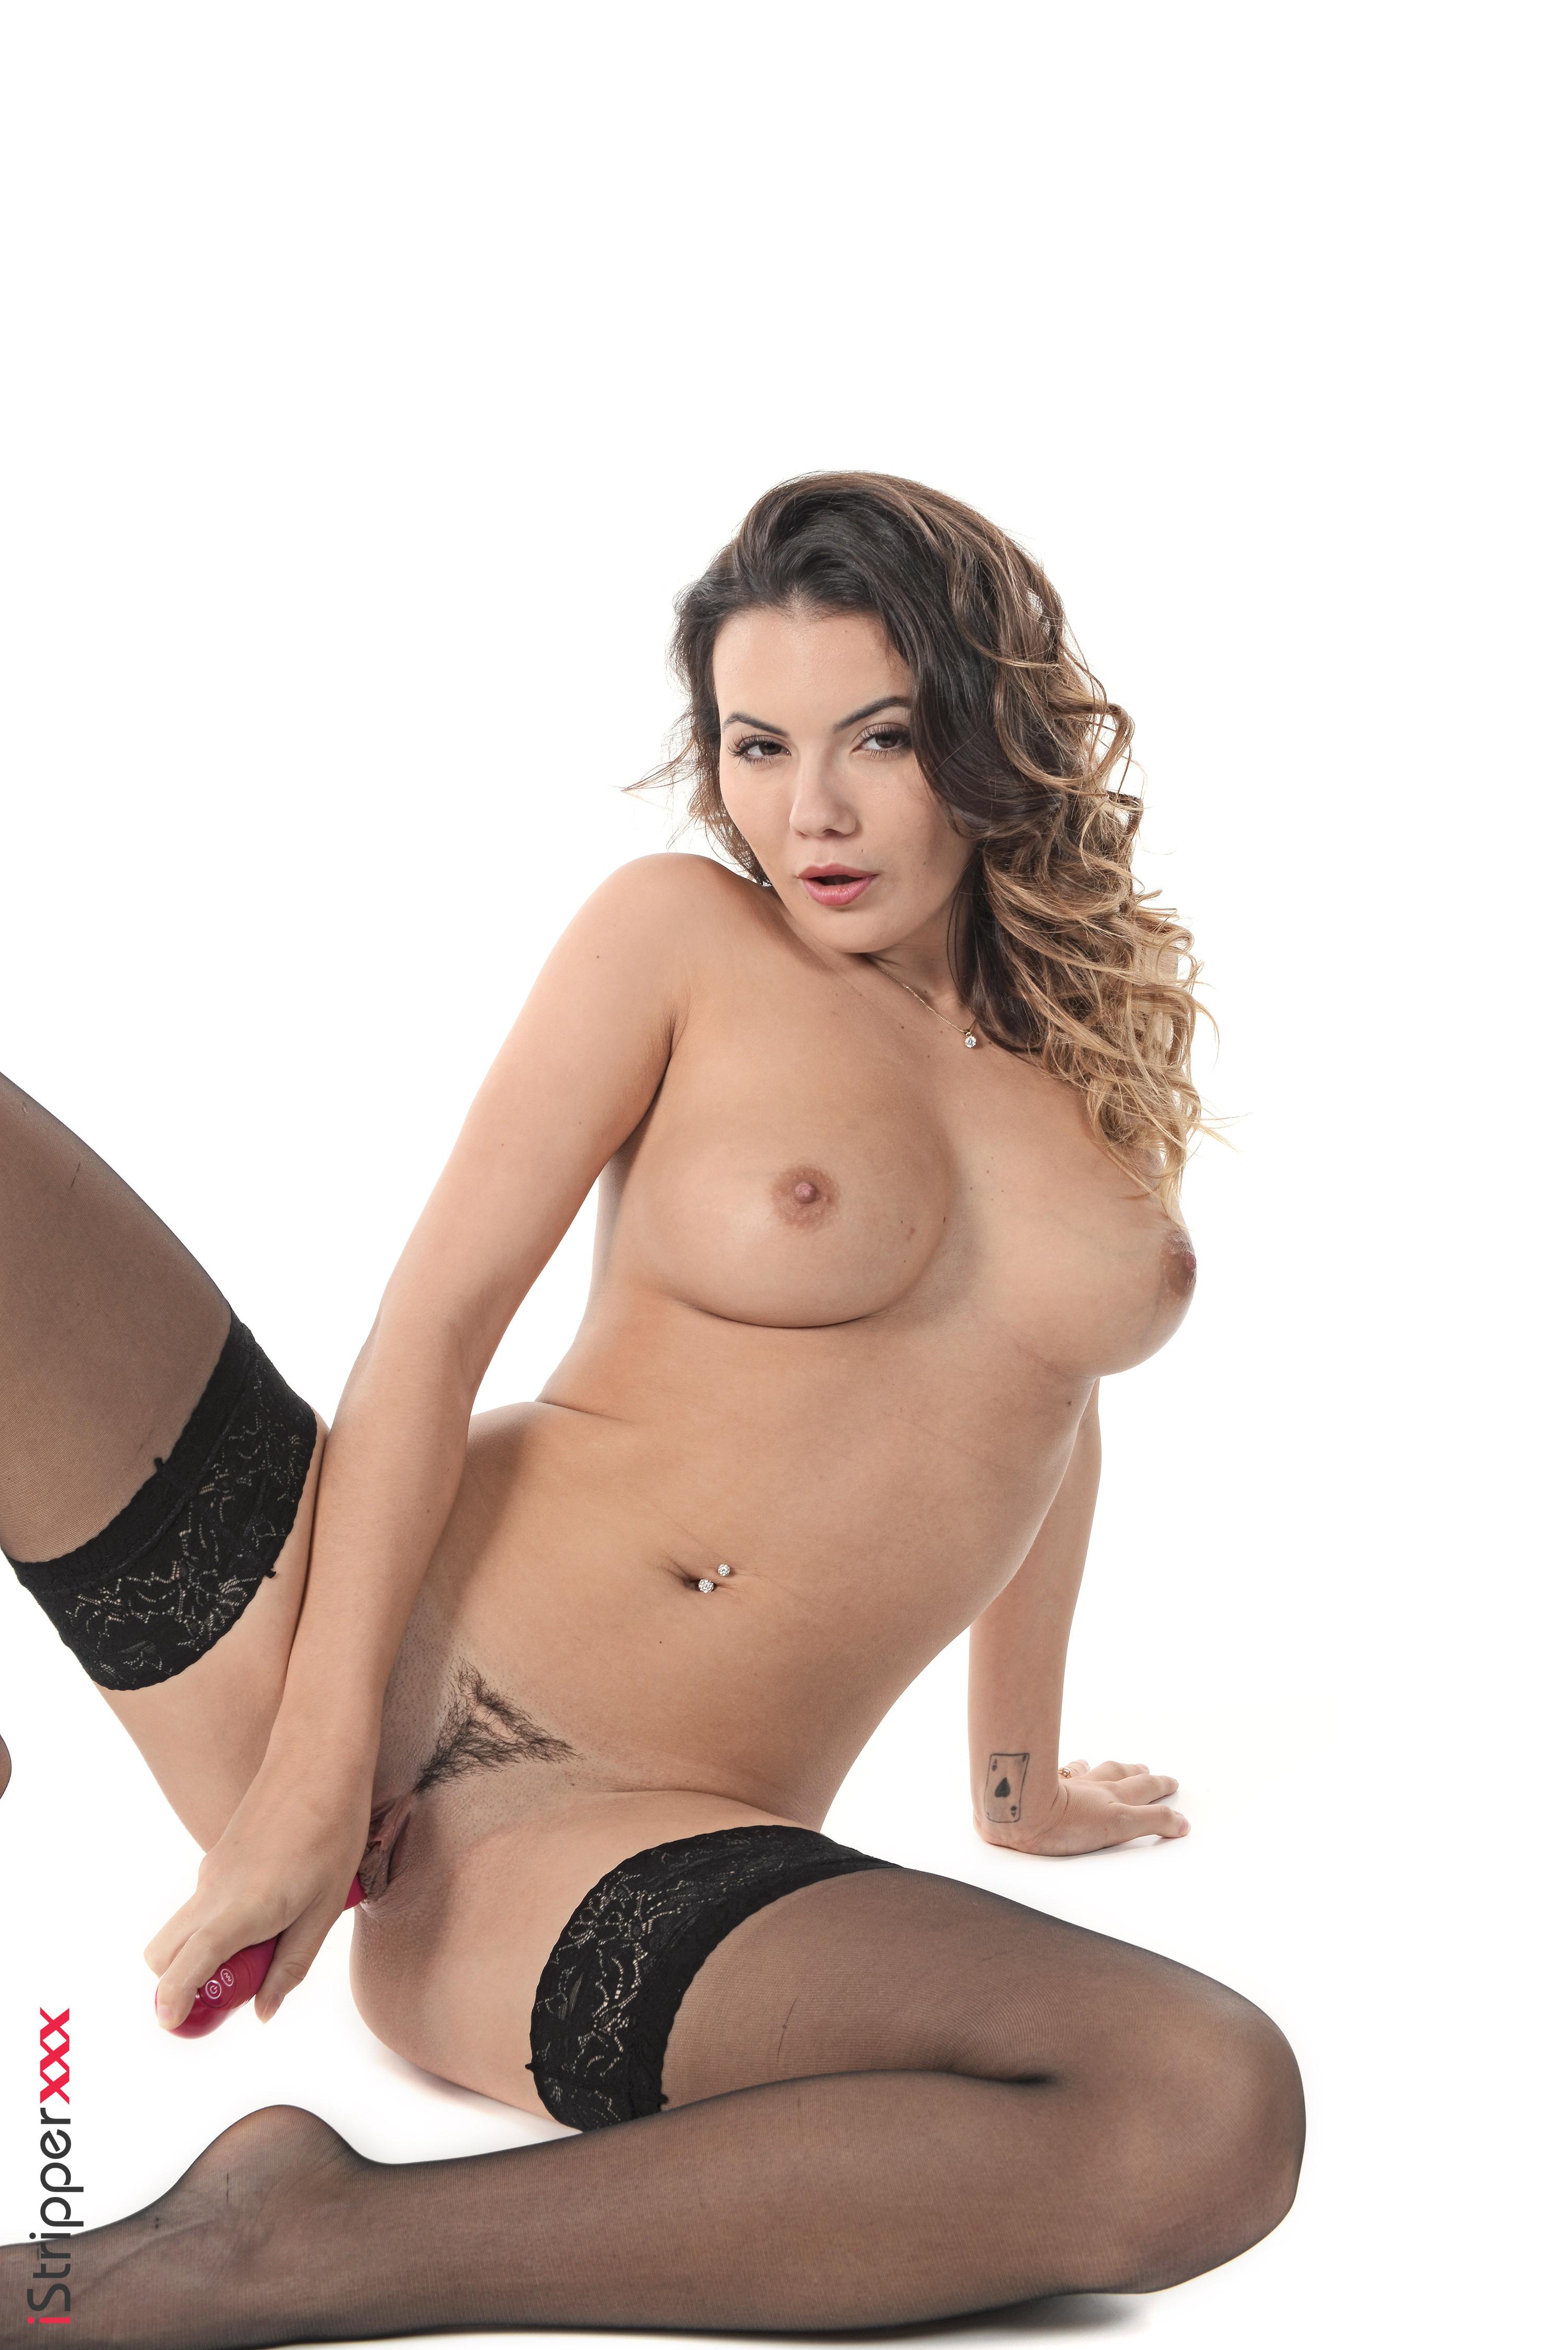 cute girls stripping